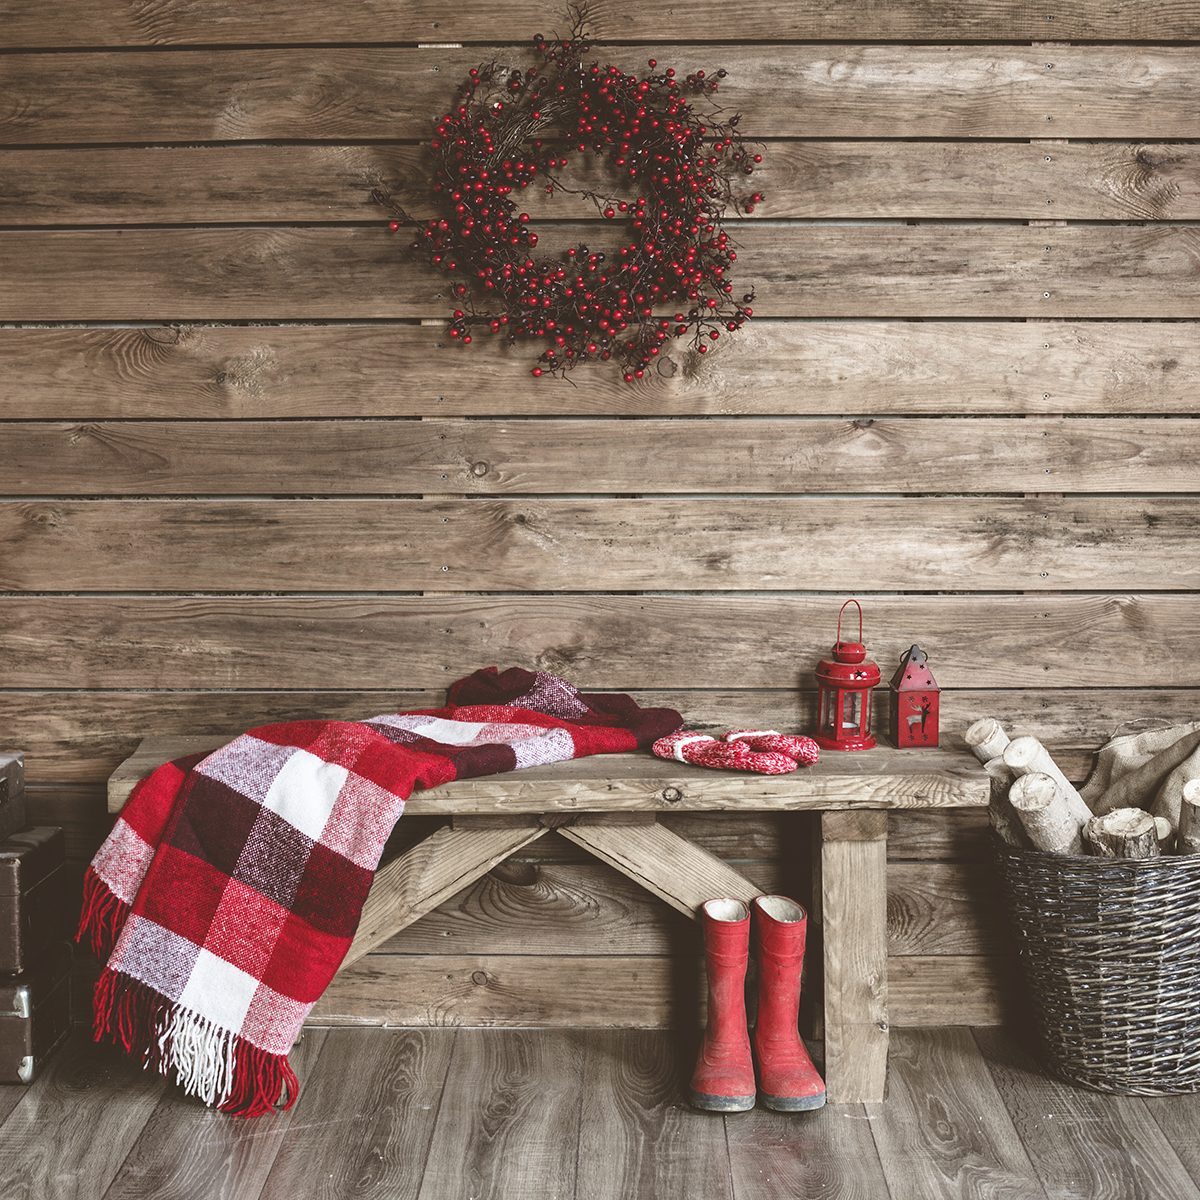 Winter home decor. Christmas rustic interior.